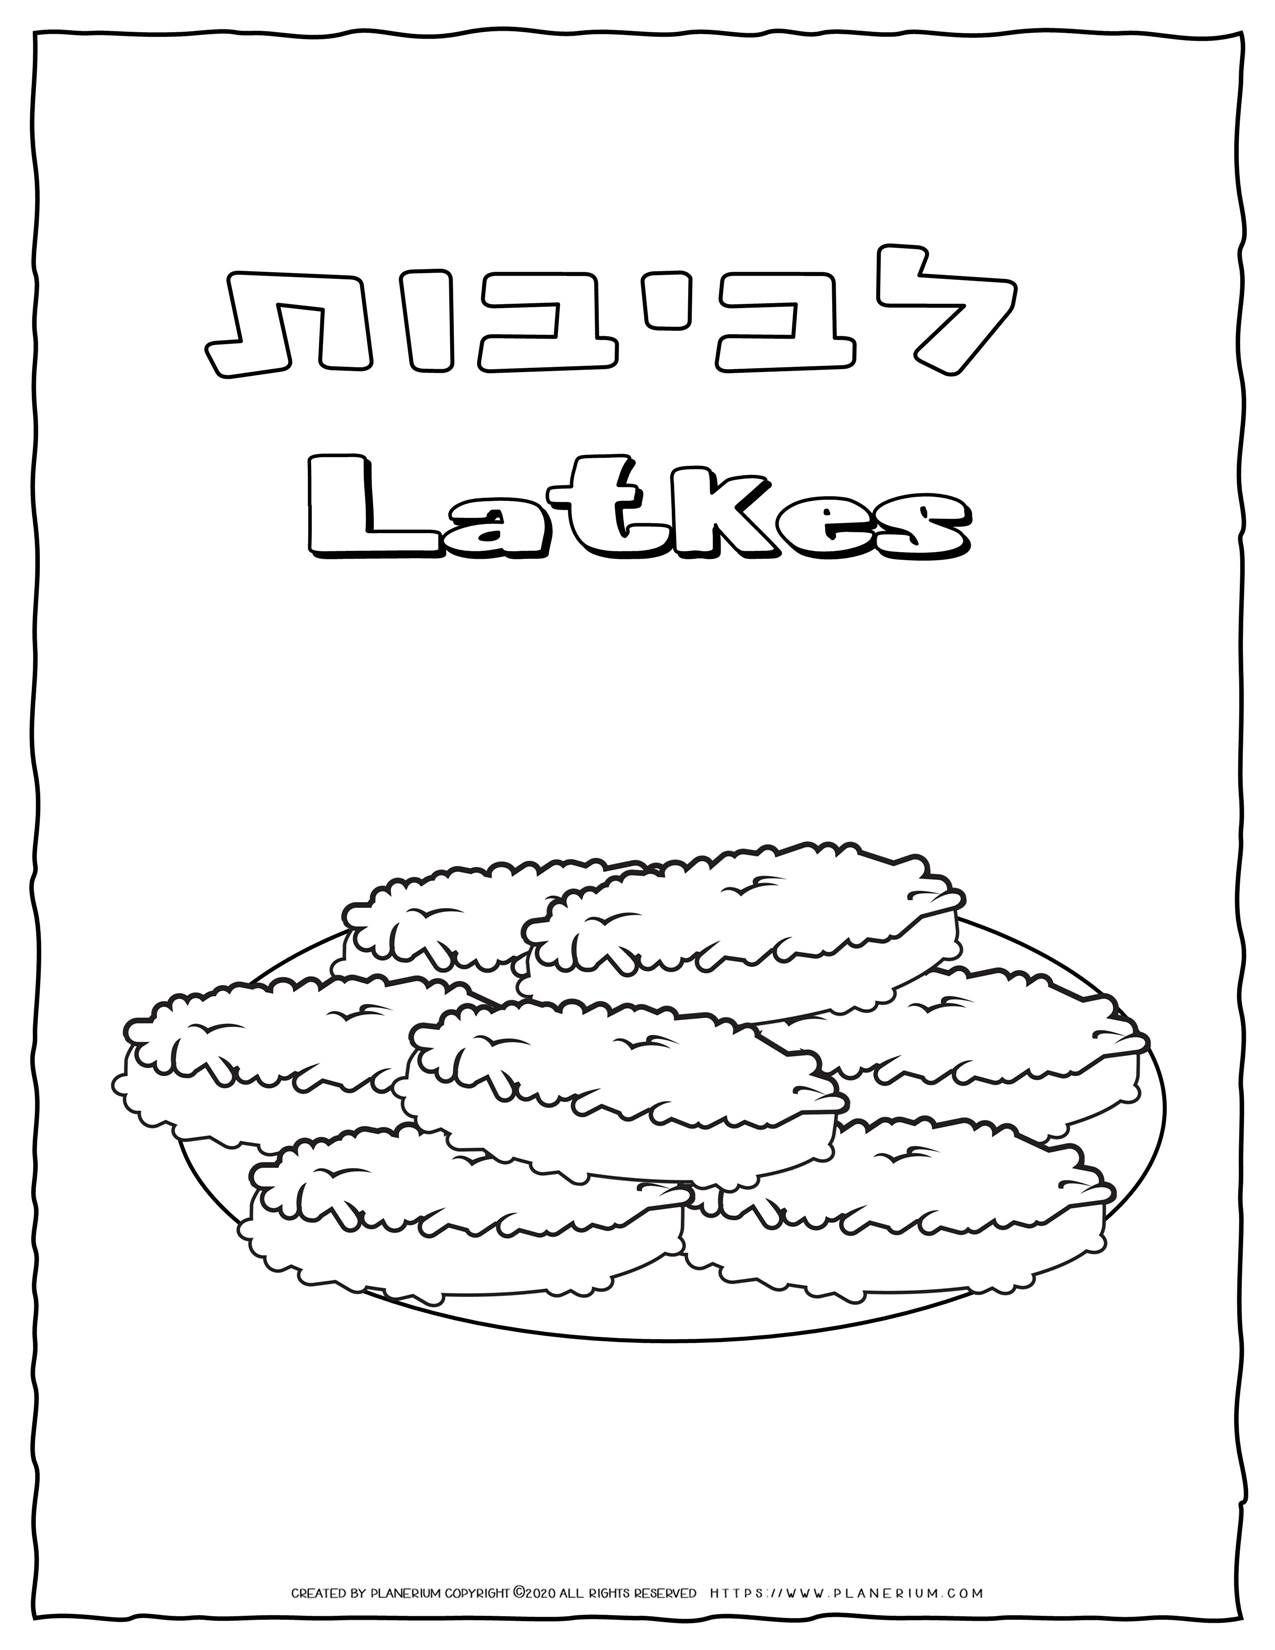 Latkes Hanukkah Coloring Page Free Printable Planerium Coloring Pages Unique Coloring Pages Free Coloring Pages [ 1650 x 1275 Pixel ]